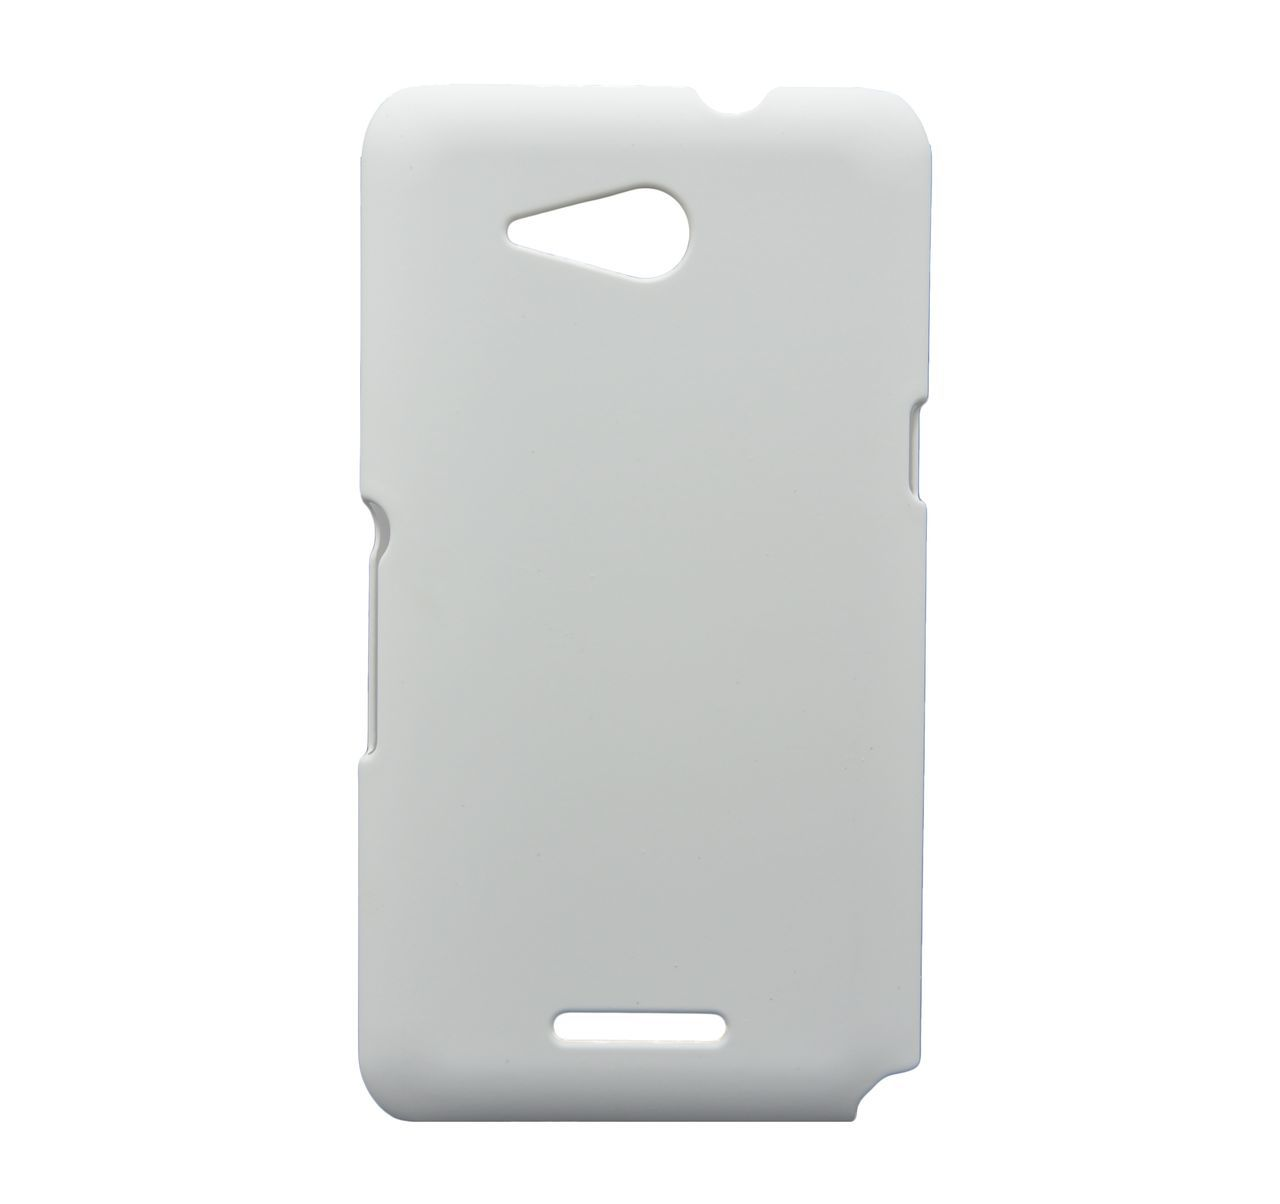 Пластиковая накладка белая для Xperia E4G в Sony Centre Воронеж